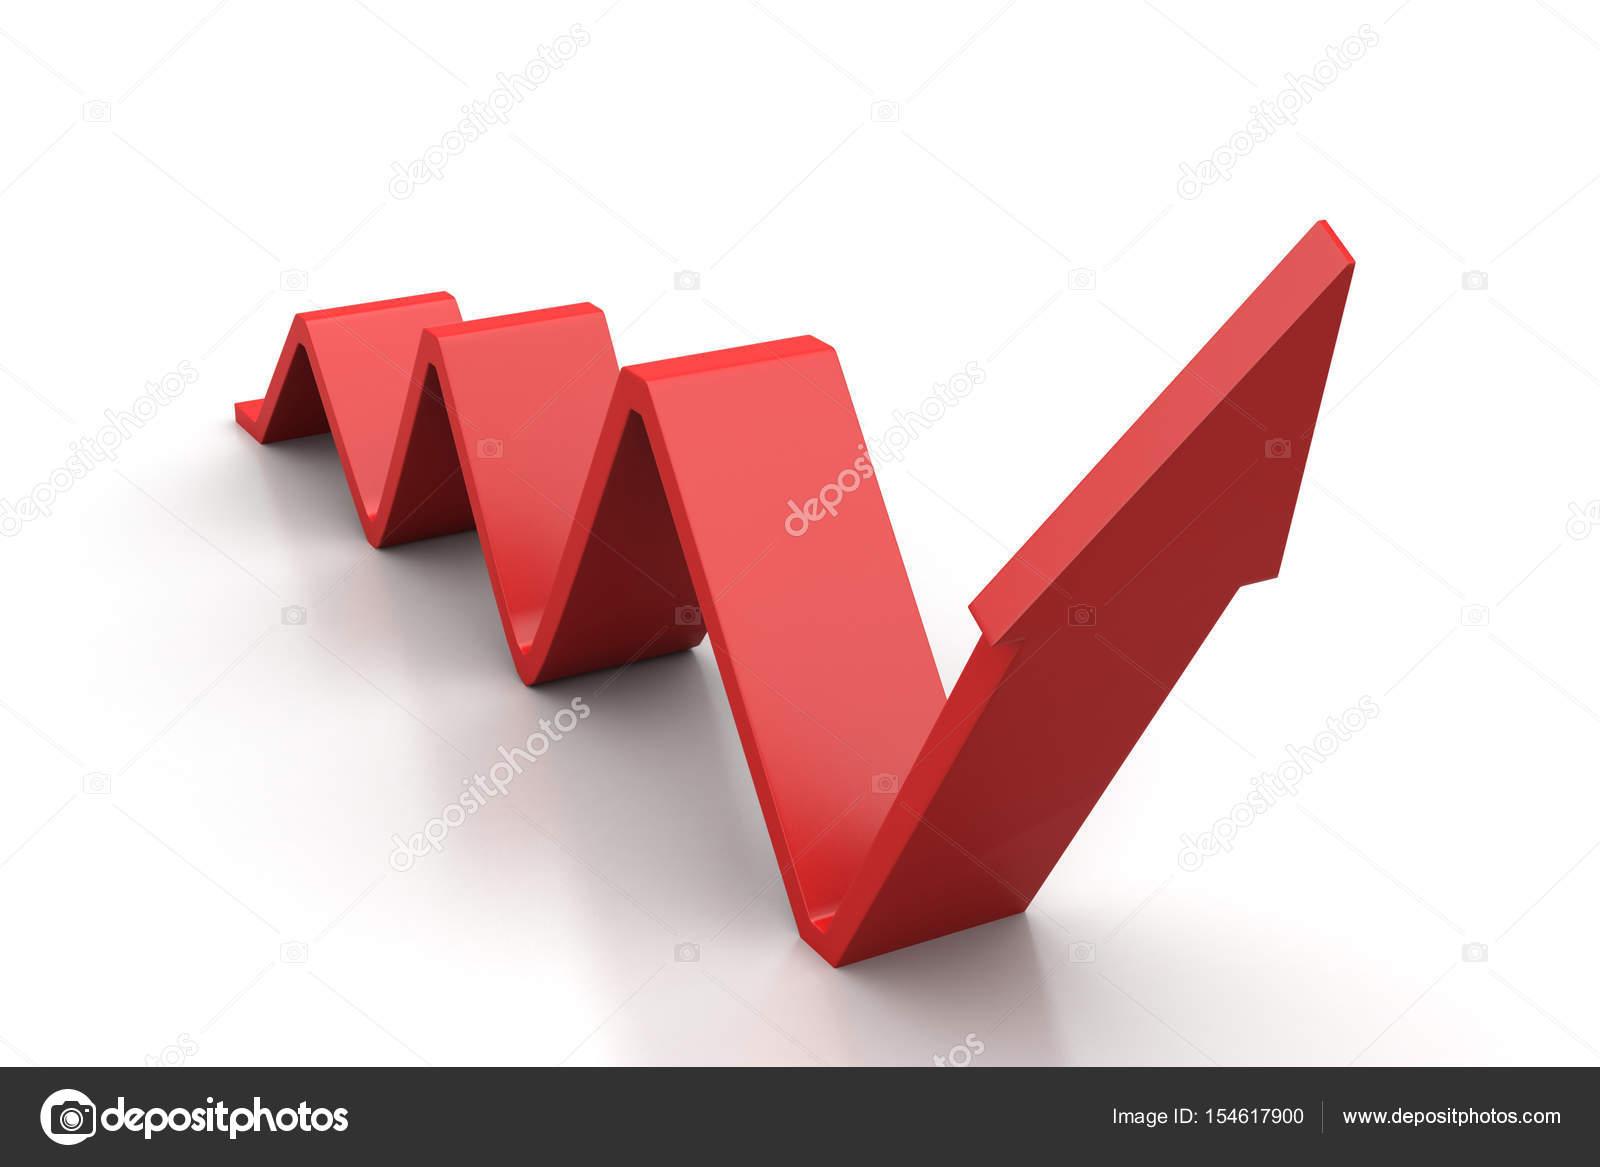 Grfico movendo se para o sucesso stock photo manojmadhu144 grfico movendo se para o sucesso fotografia de stock ccuart Image collections